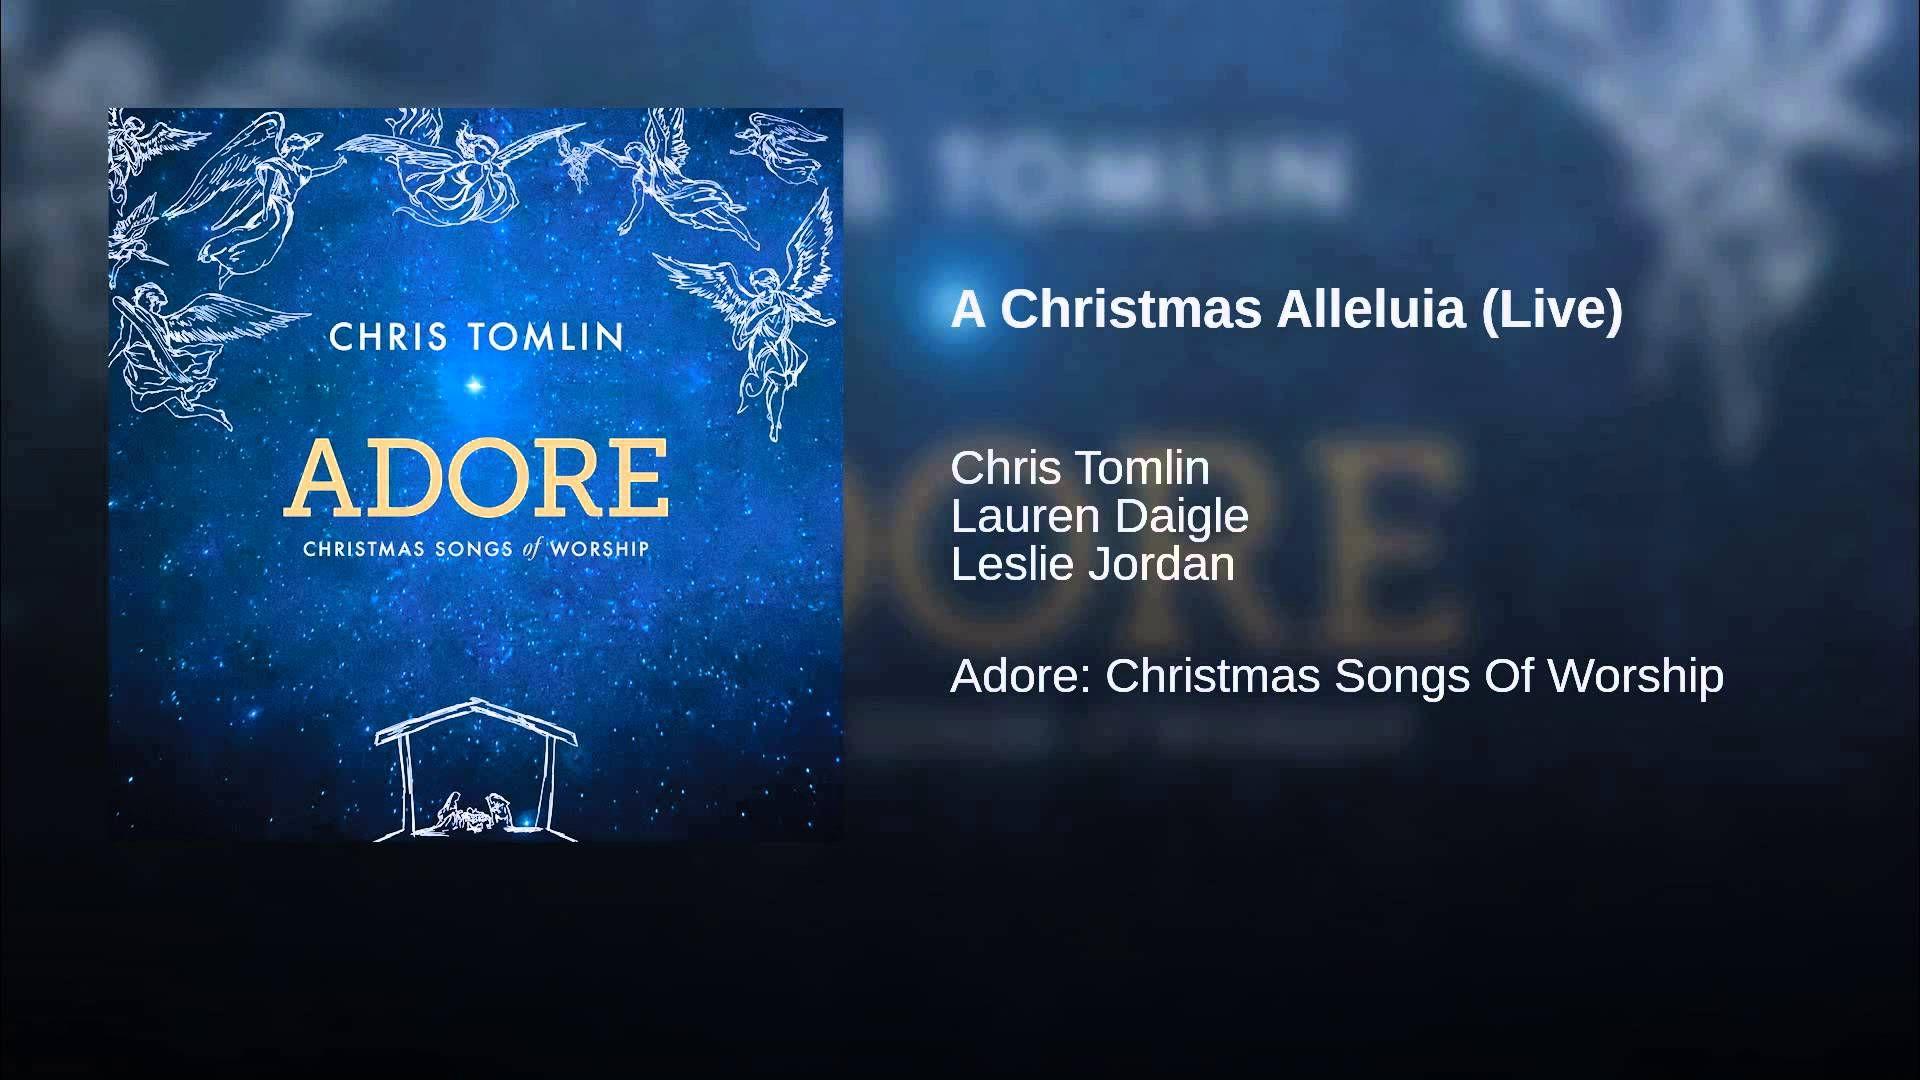 A Christmas Alleluia (Live) Christian christmas songs